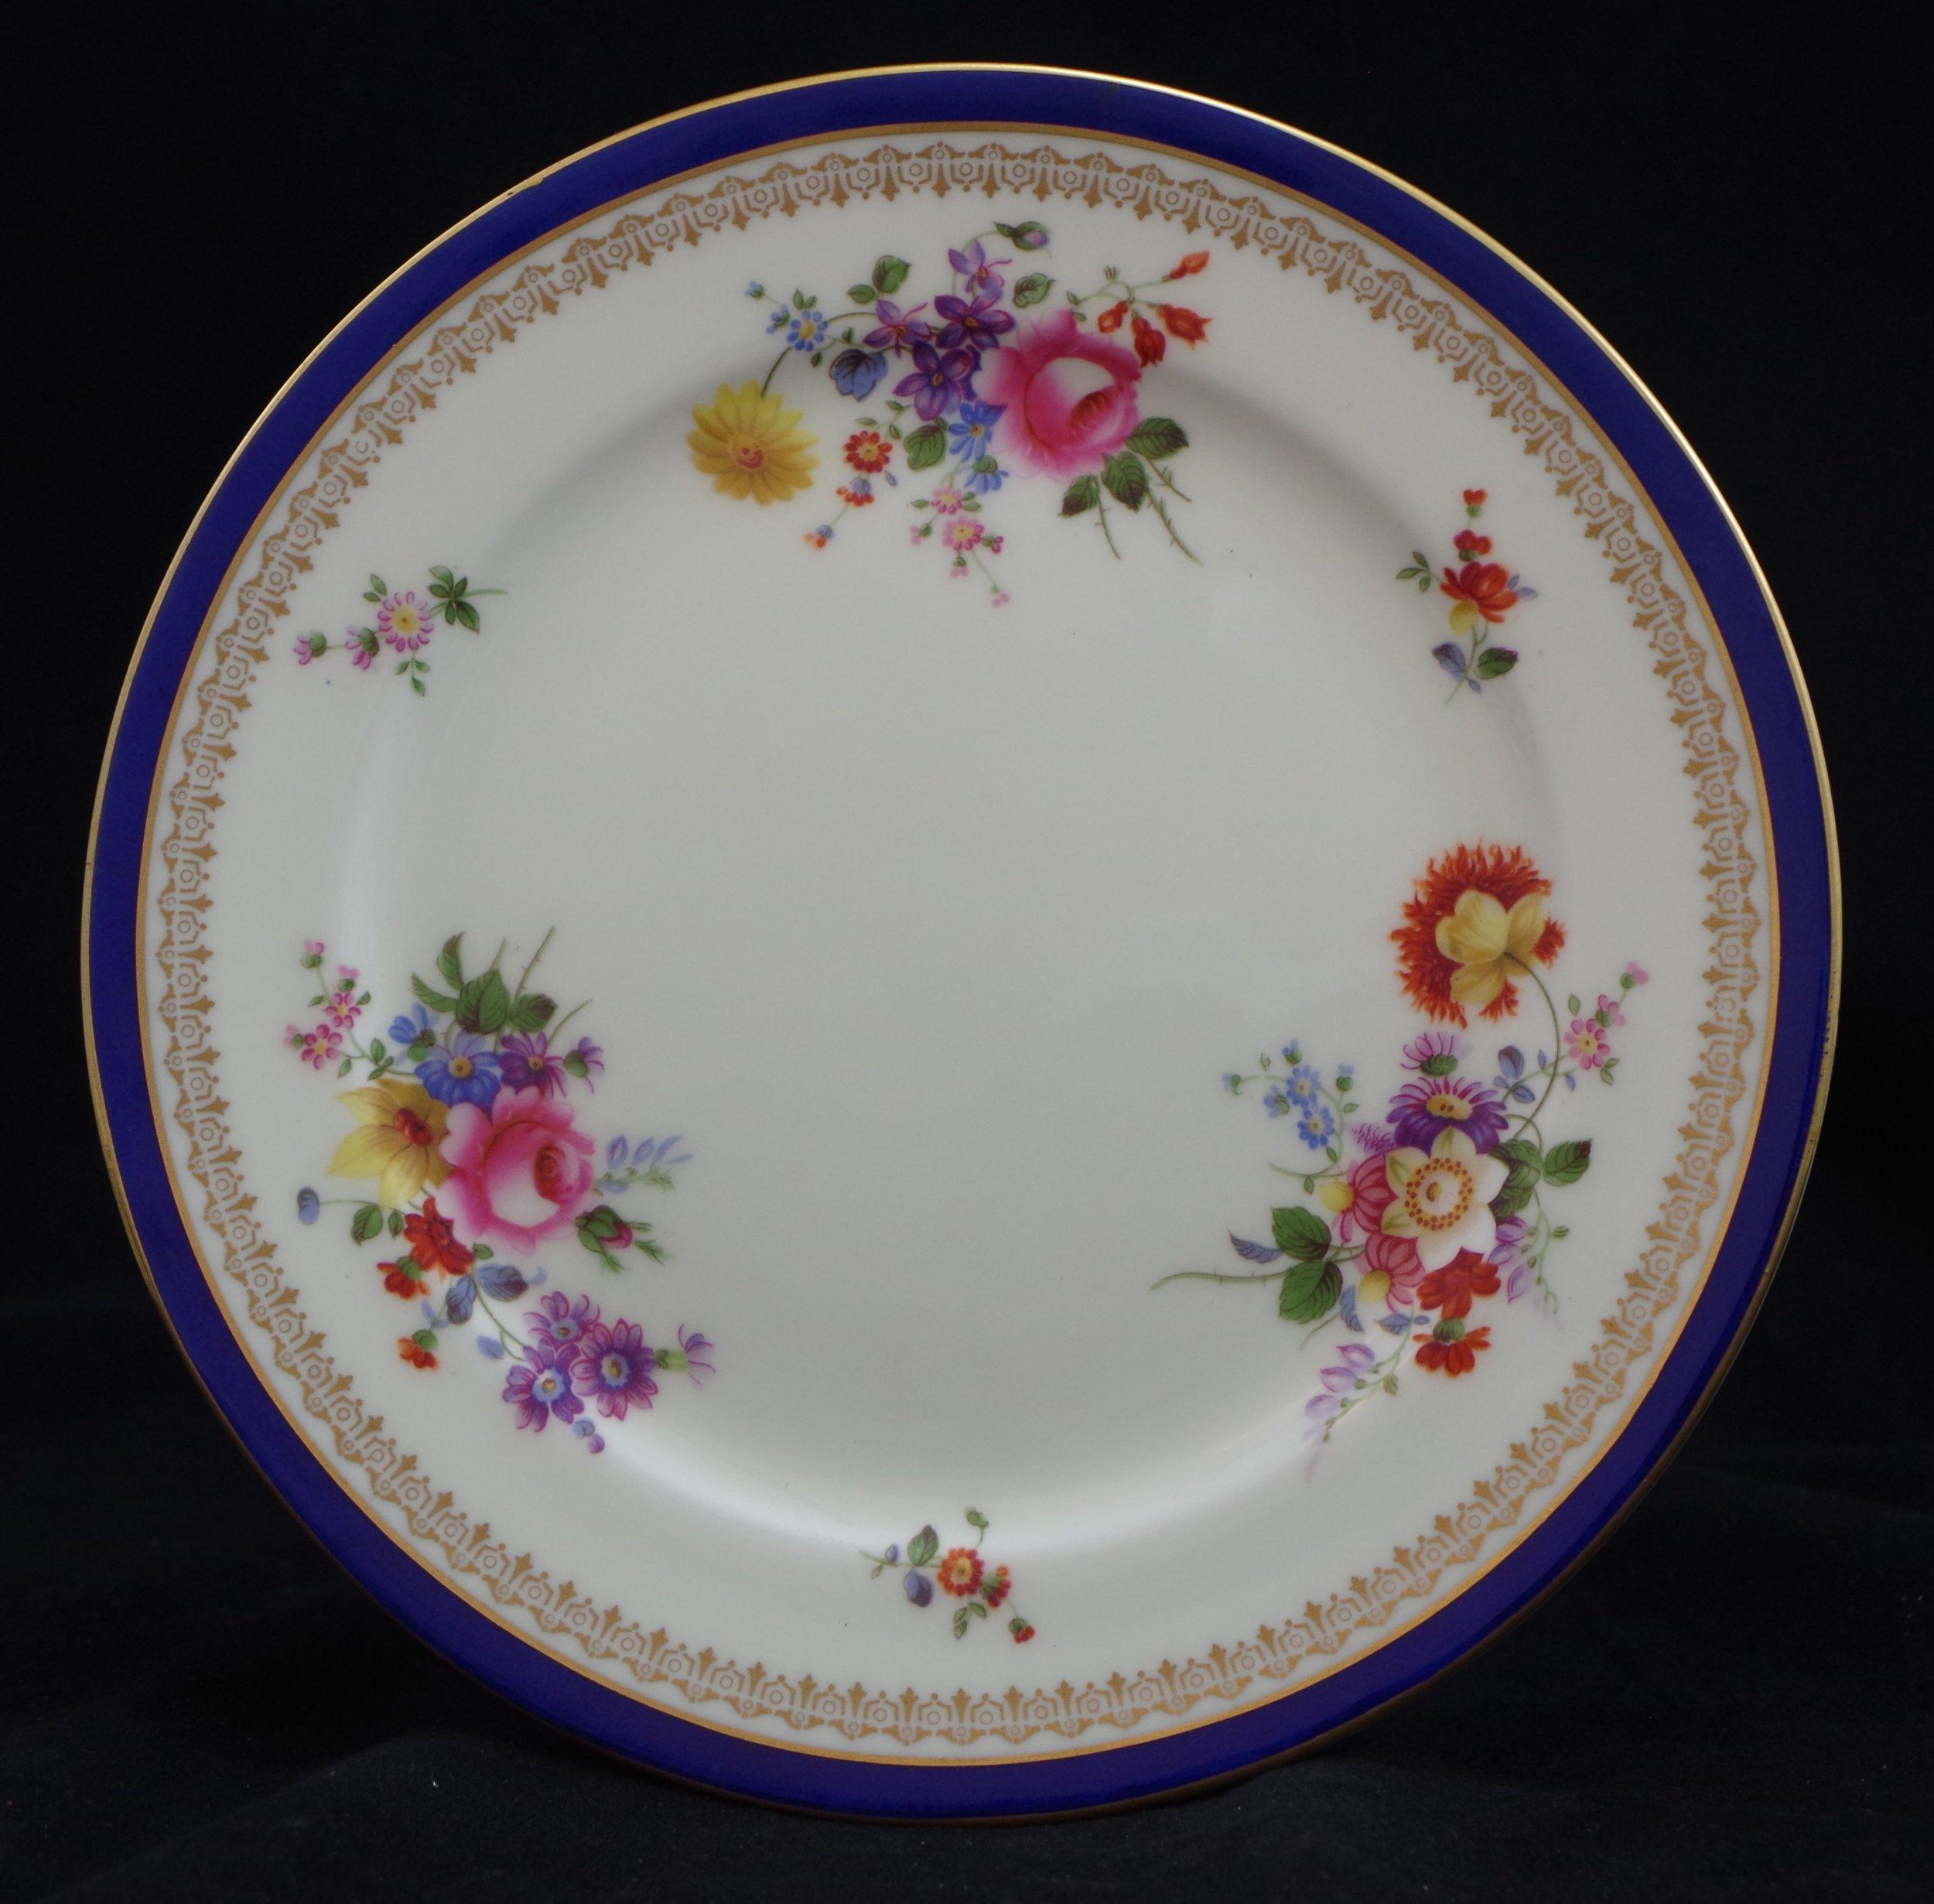 royal-crown-derby-plain-shape-cobalt-band-posie-pattern